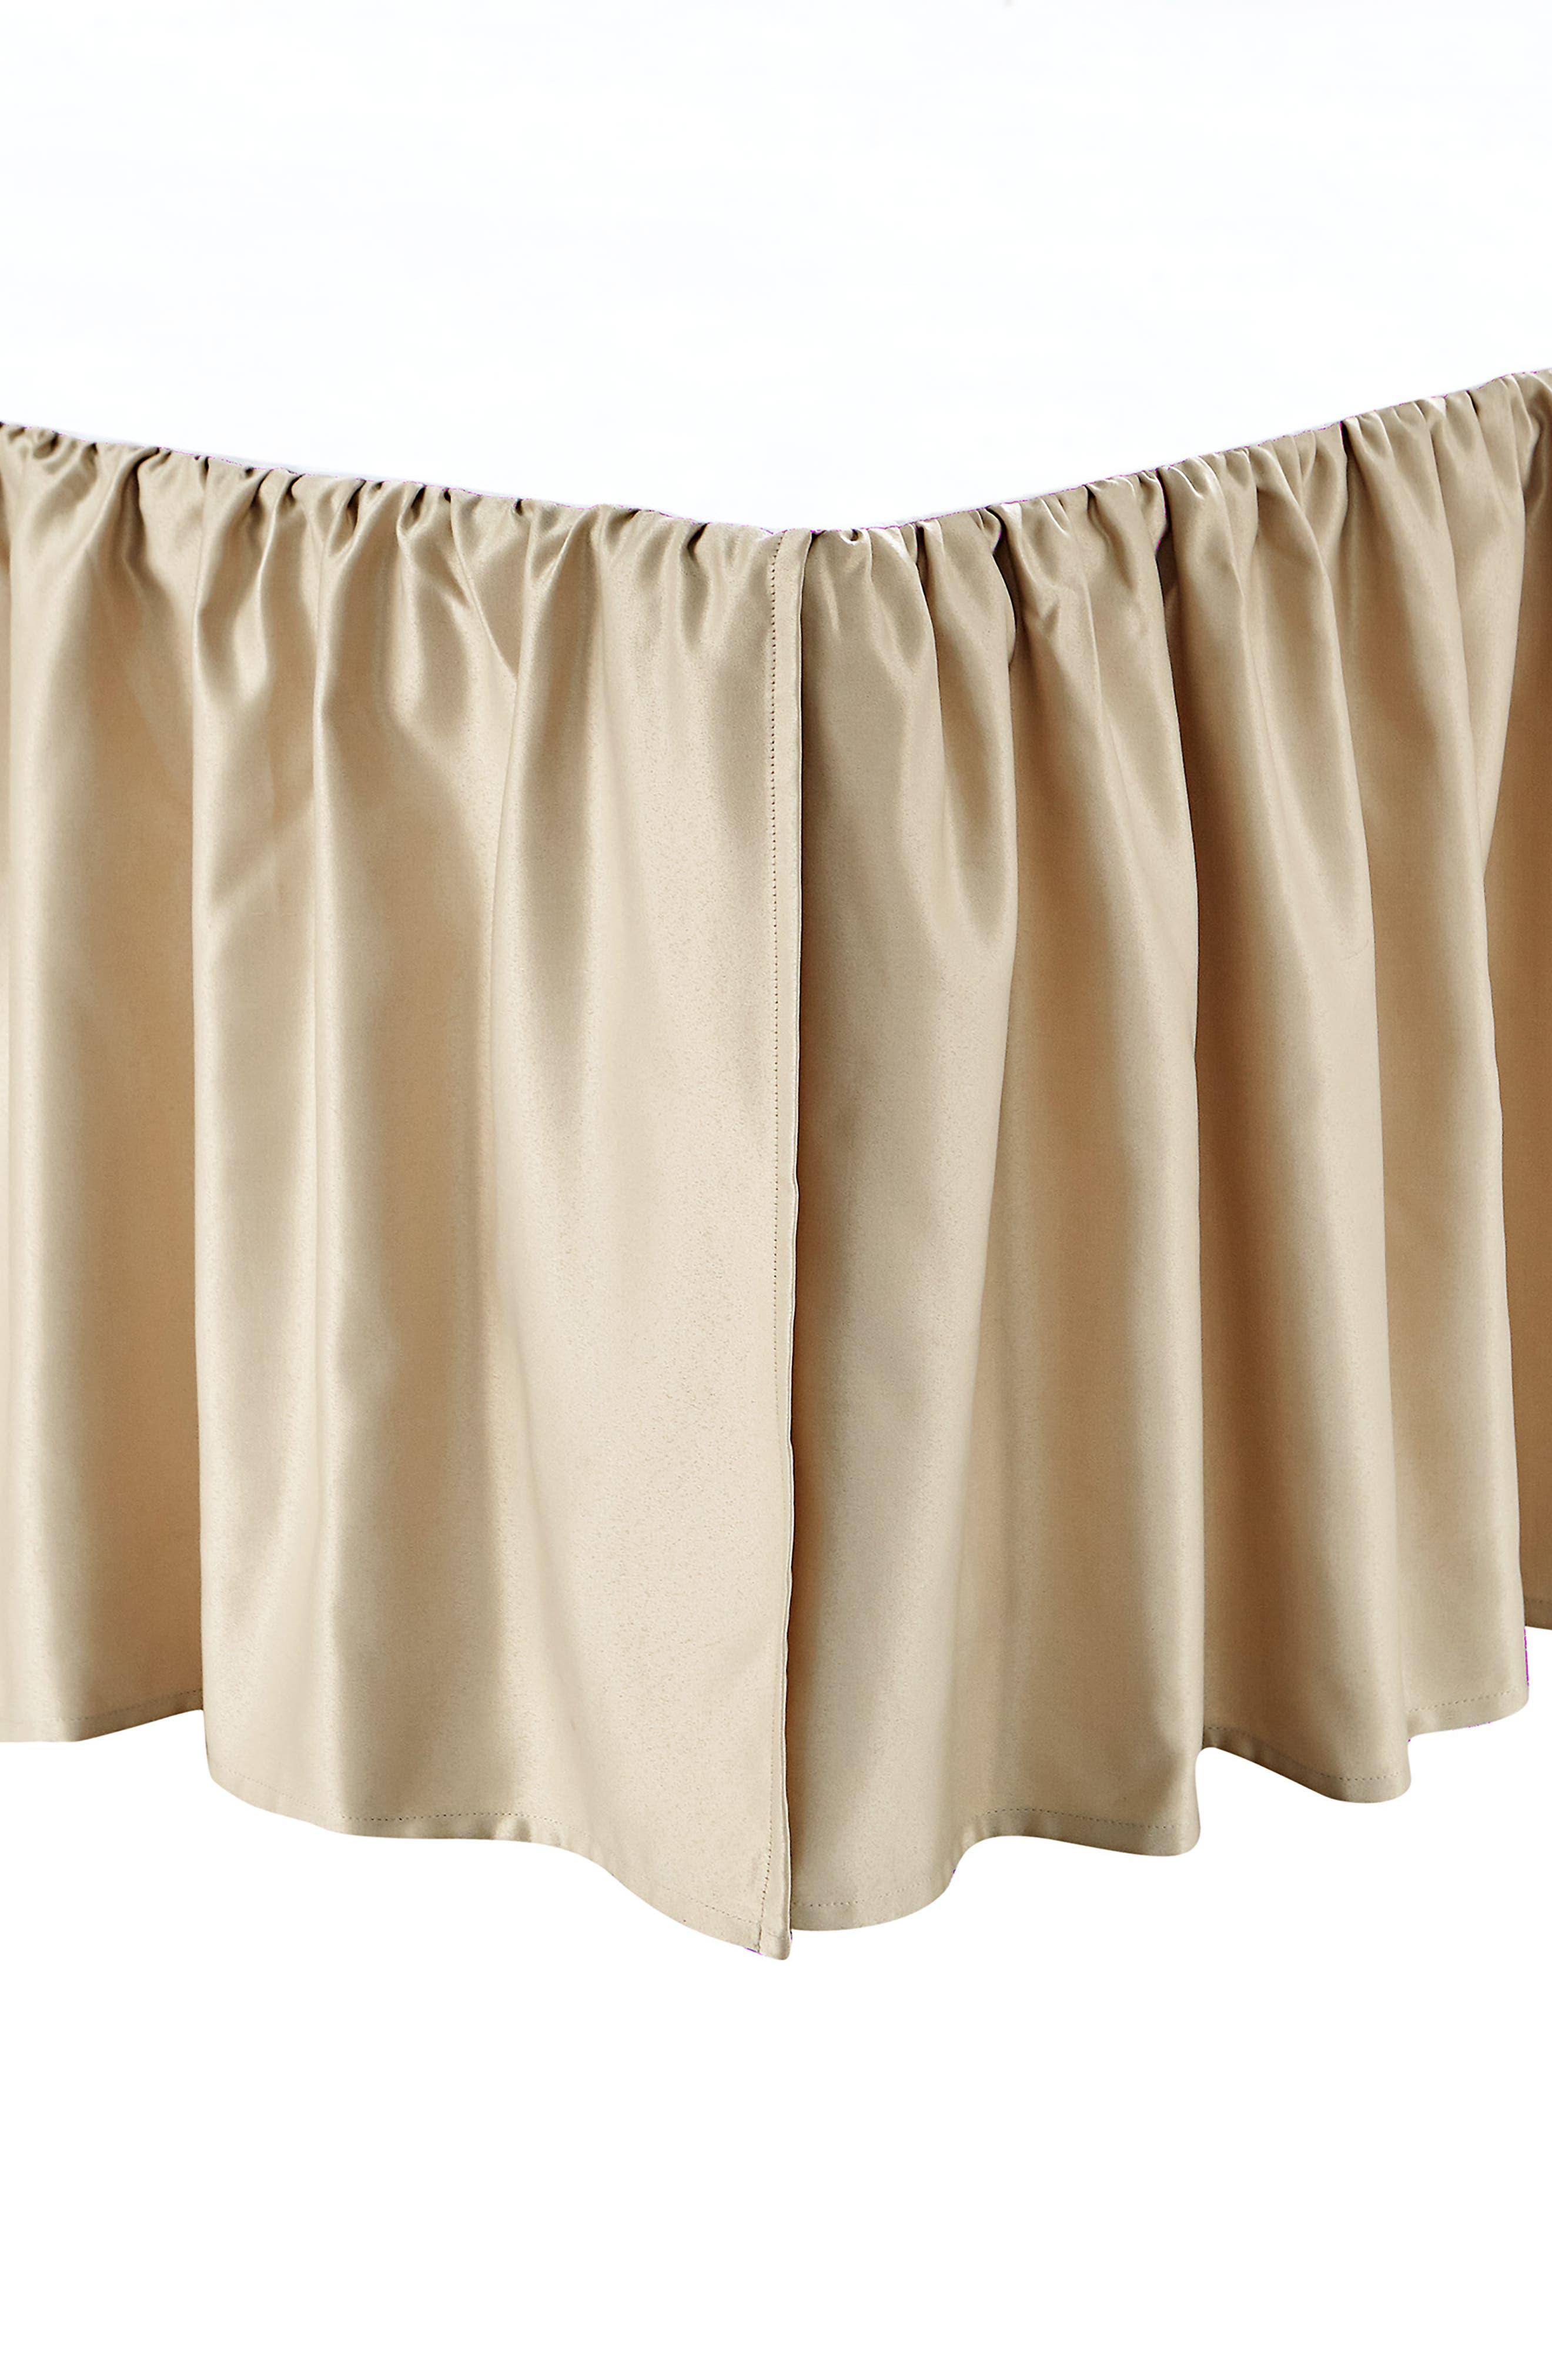 WATERFORD, Anora Comforter, Sham & Bed Skirt Set, Alternate thumbnail 4, color, BRASS/ JADE